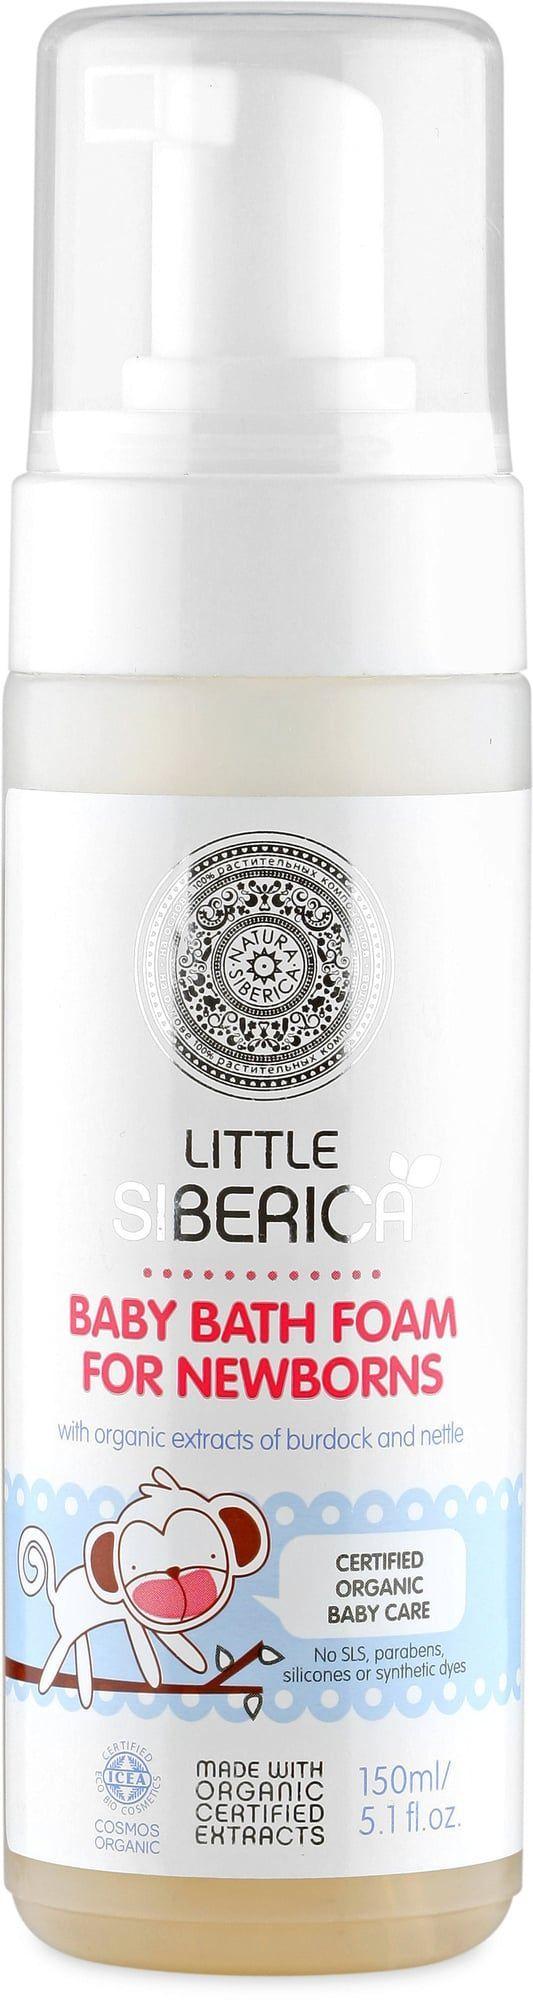 Natura Siberica Little Siberica Pianka do kąpieli dla noworodków +0 150ml 1